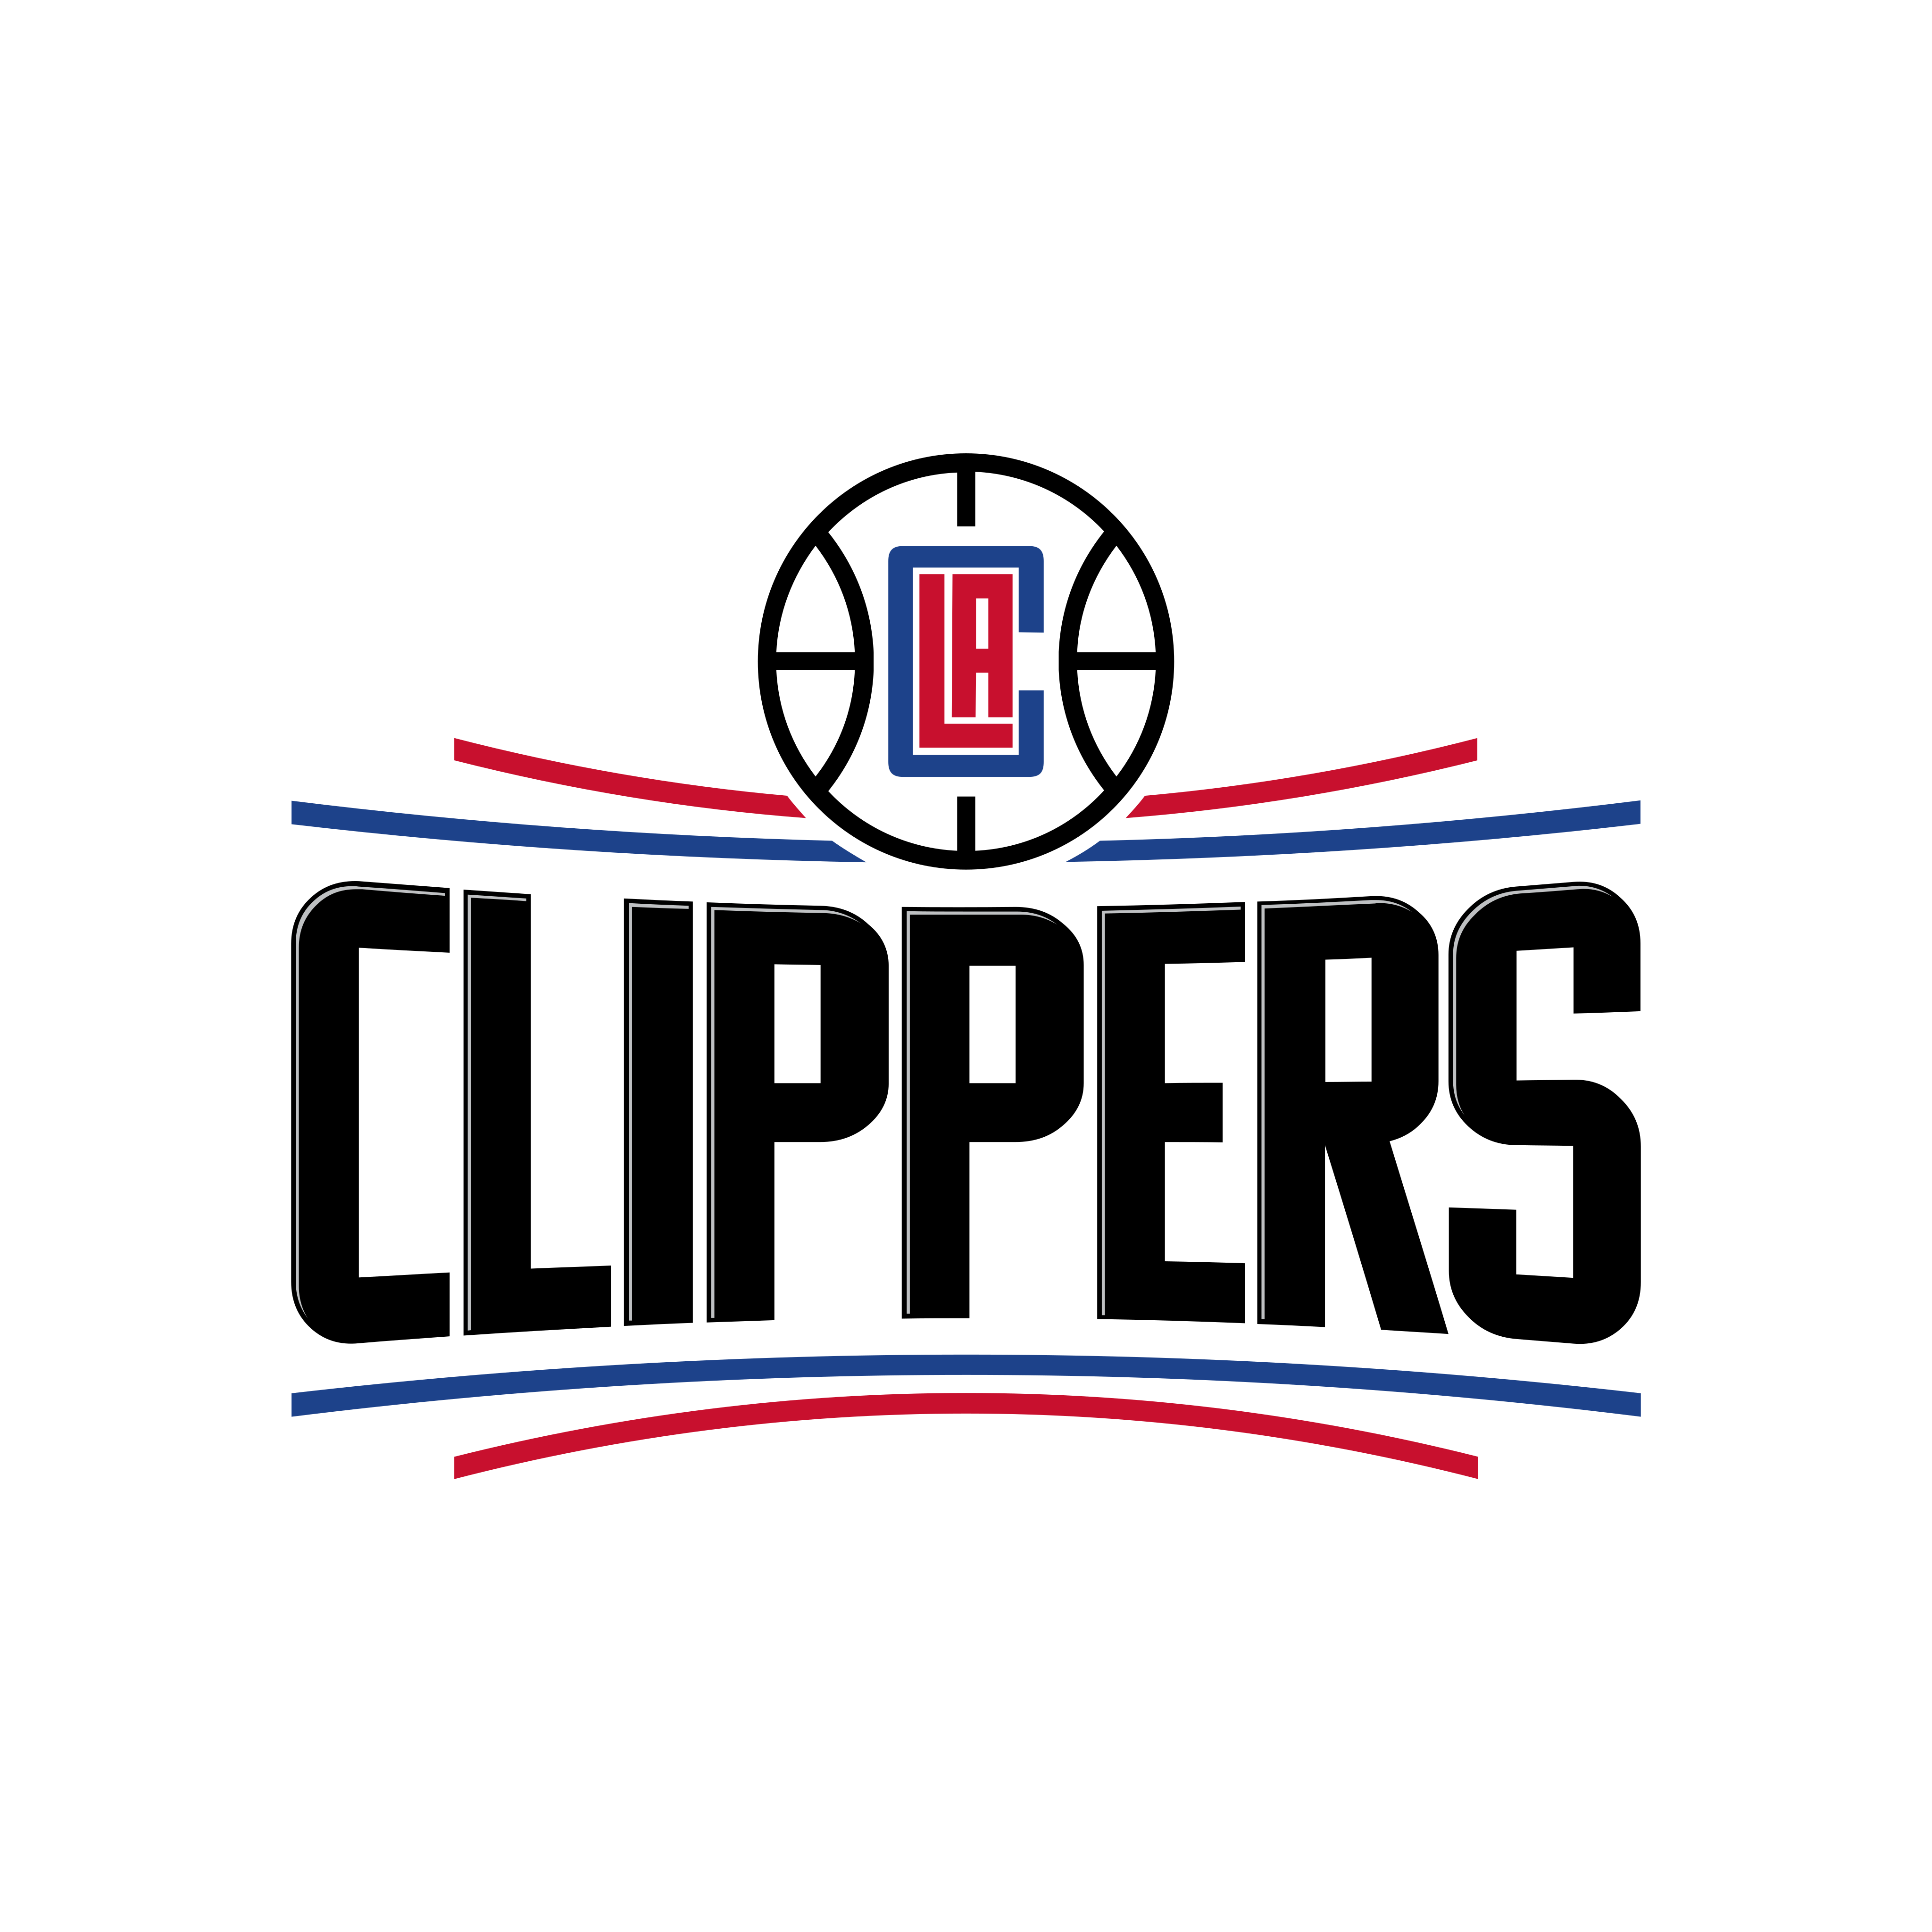 la clippers logo 0 - LA Clippers Logo